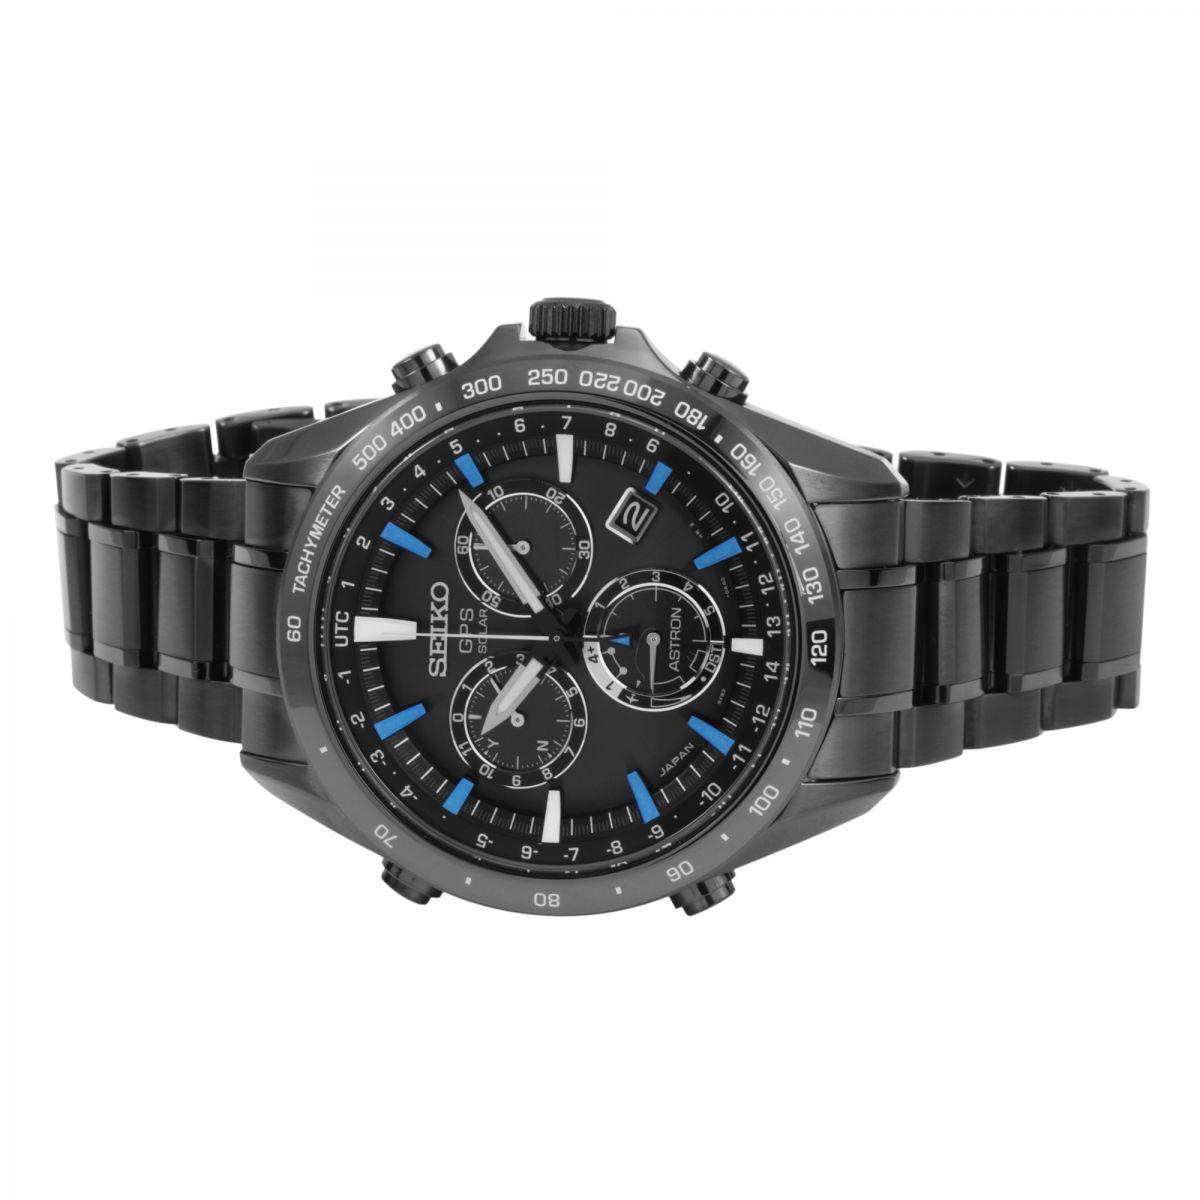 gents seiko astron gps chronograph watch sse013j1 watchshop com rh watchshop com Seiko Astron Limited Edition Seiko Astron Limited Edition